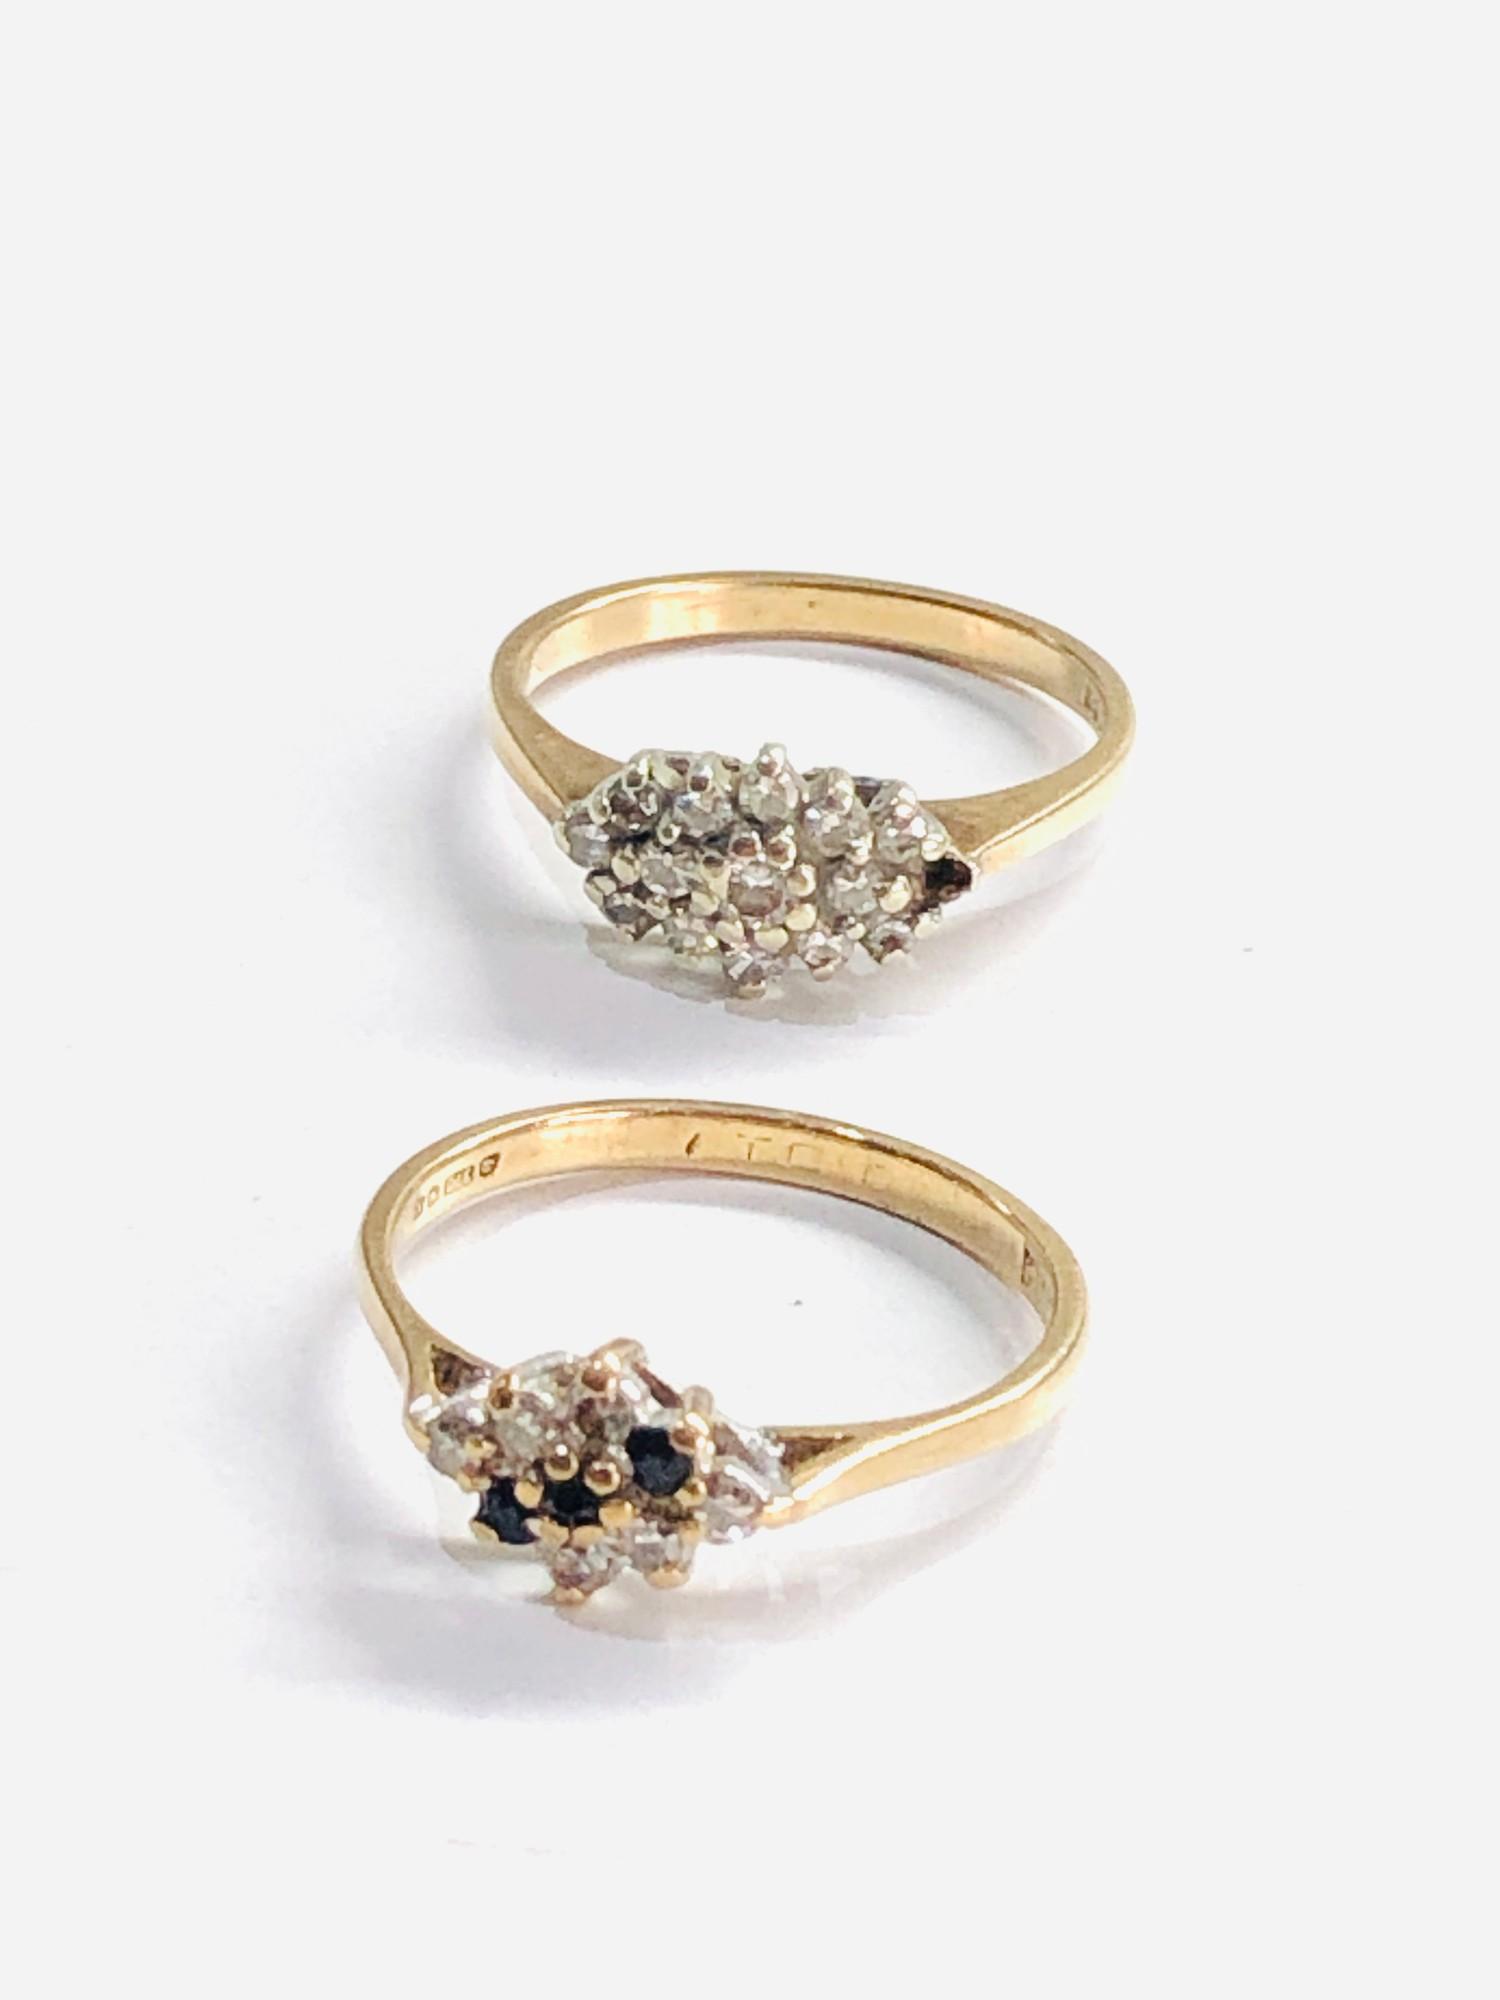 2 x 9ct gold diamond rings missing 1 diamond 3.7g